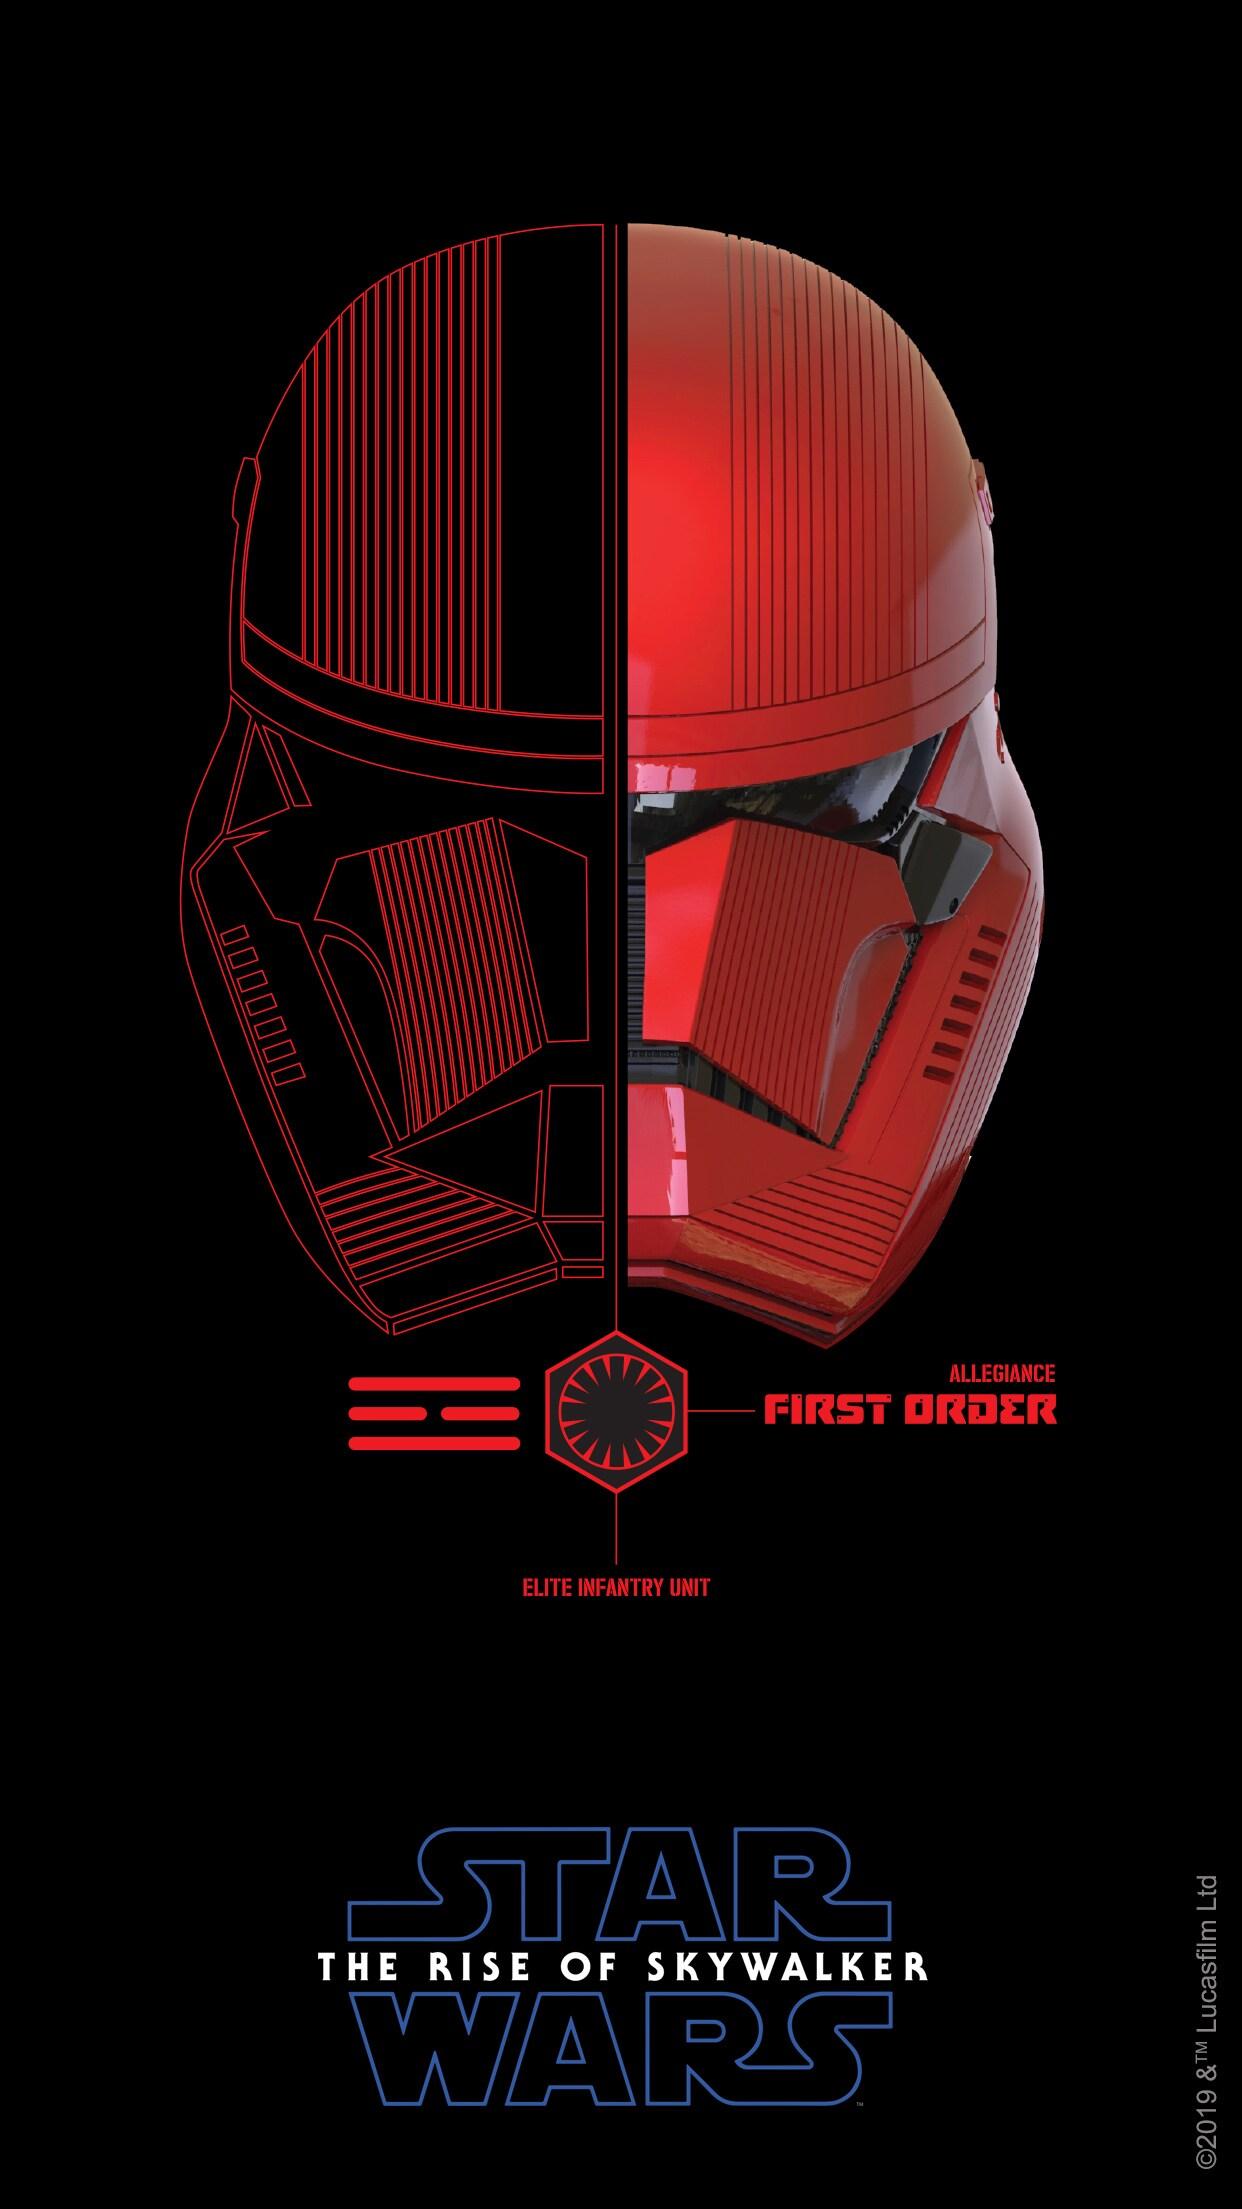 Star Wars First Order Wallpaper Hd